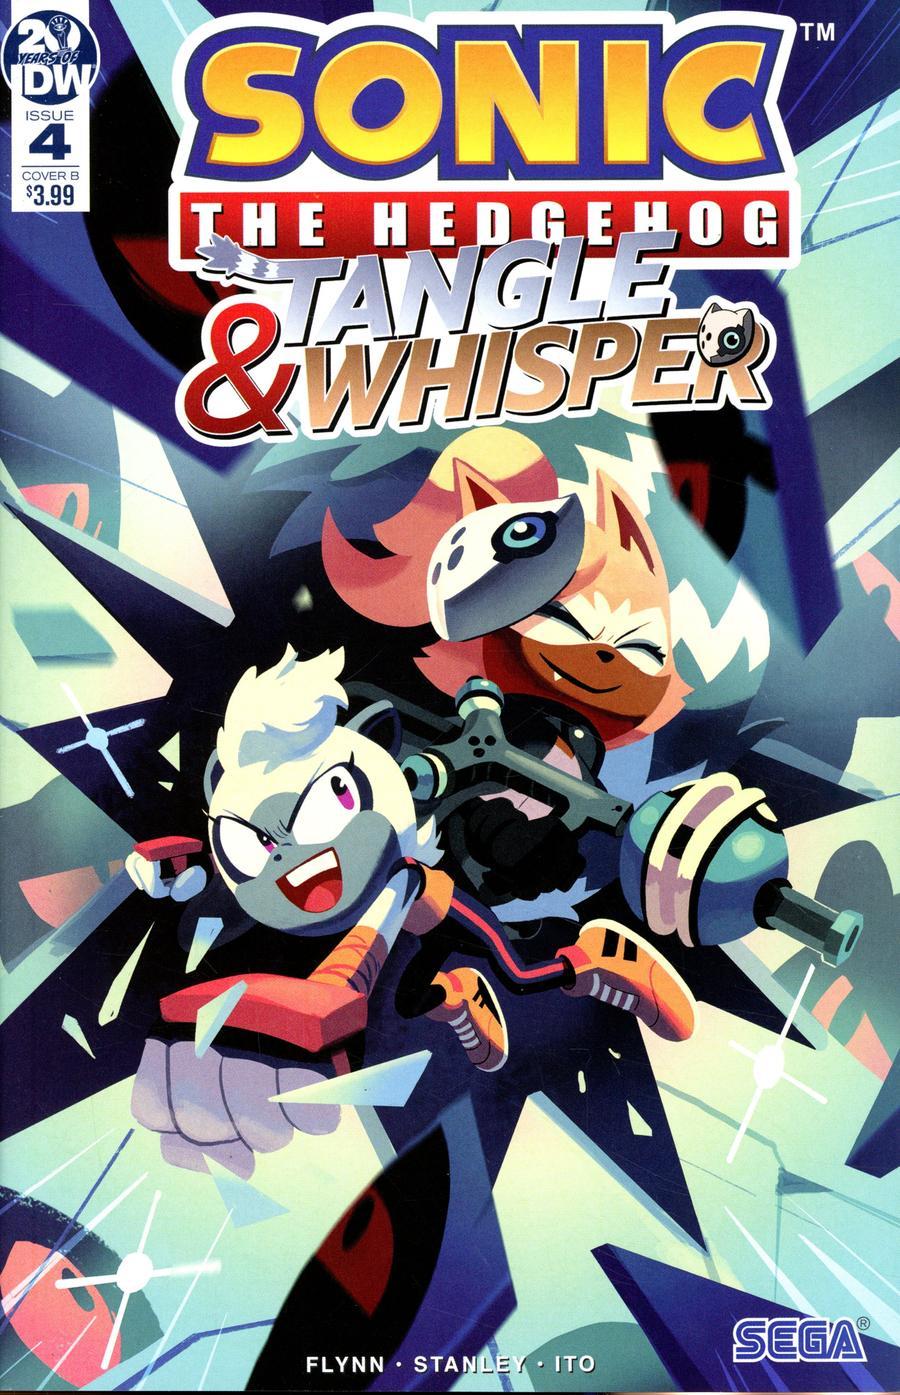 Sonic The Hedgehog Tangle Whisper 4 Cover B Variant Nathalie Fourdraine Cover Midtown Comics